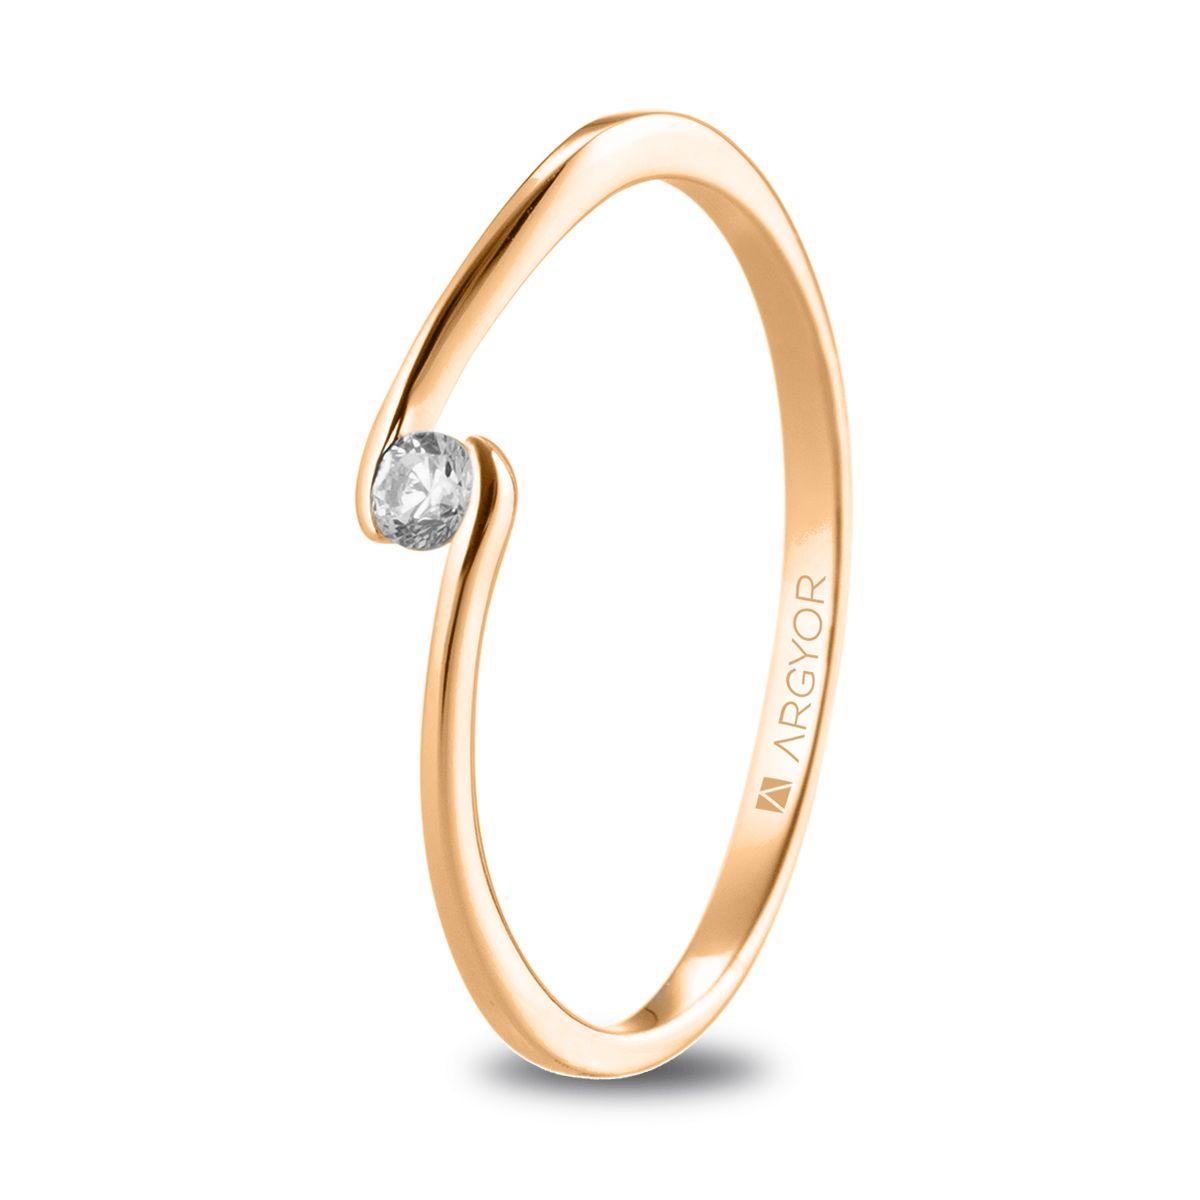 Fotos de anillos de compromiso en oro 42